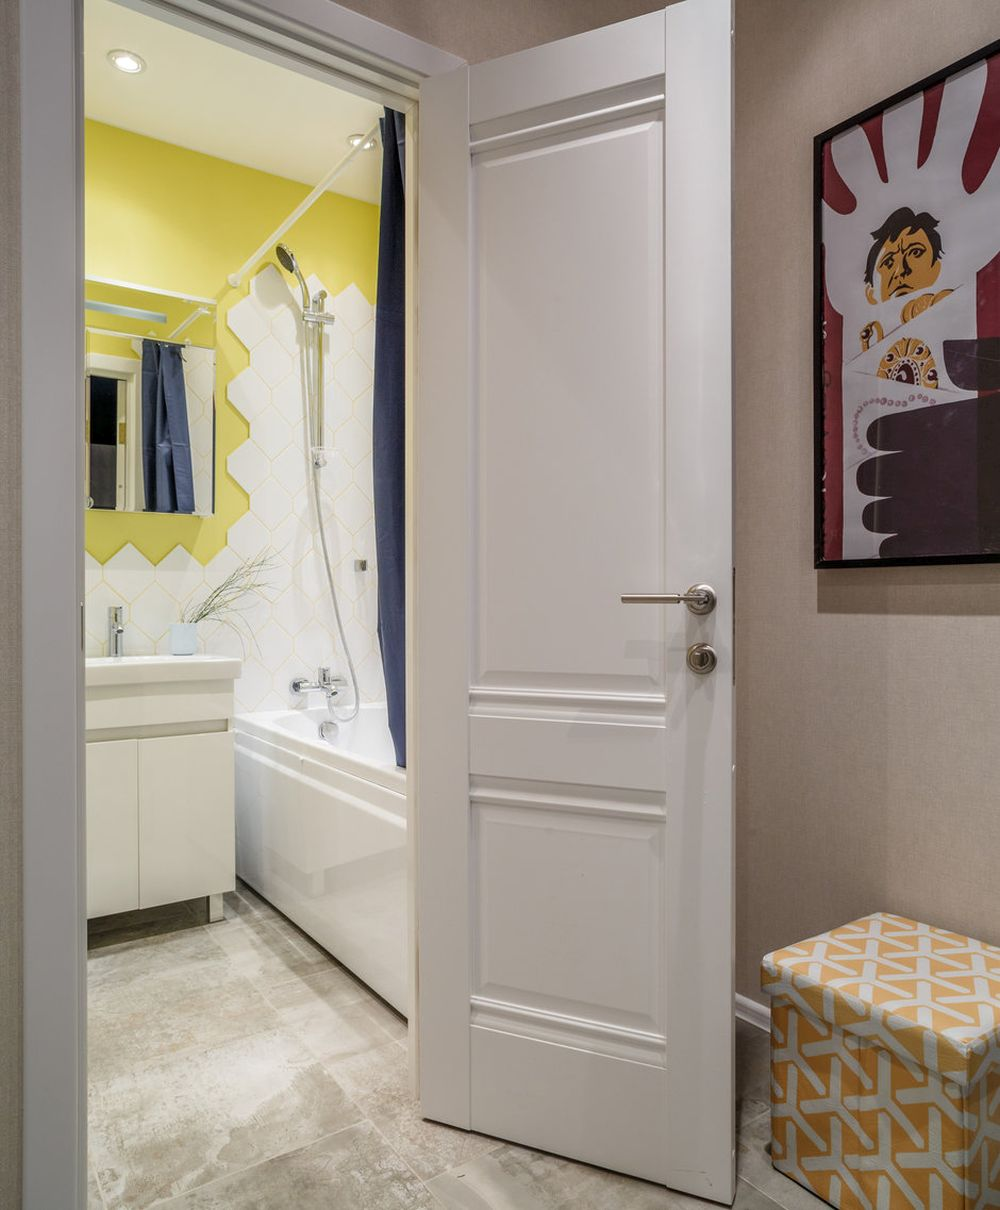 adelaparvu.com despre apartament de 2 camere in 40 mp, design Marina Novikova si Olga Ljubis, Foto Mikhail Loskutov (15)